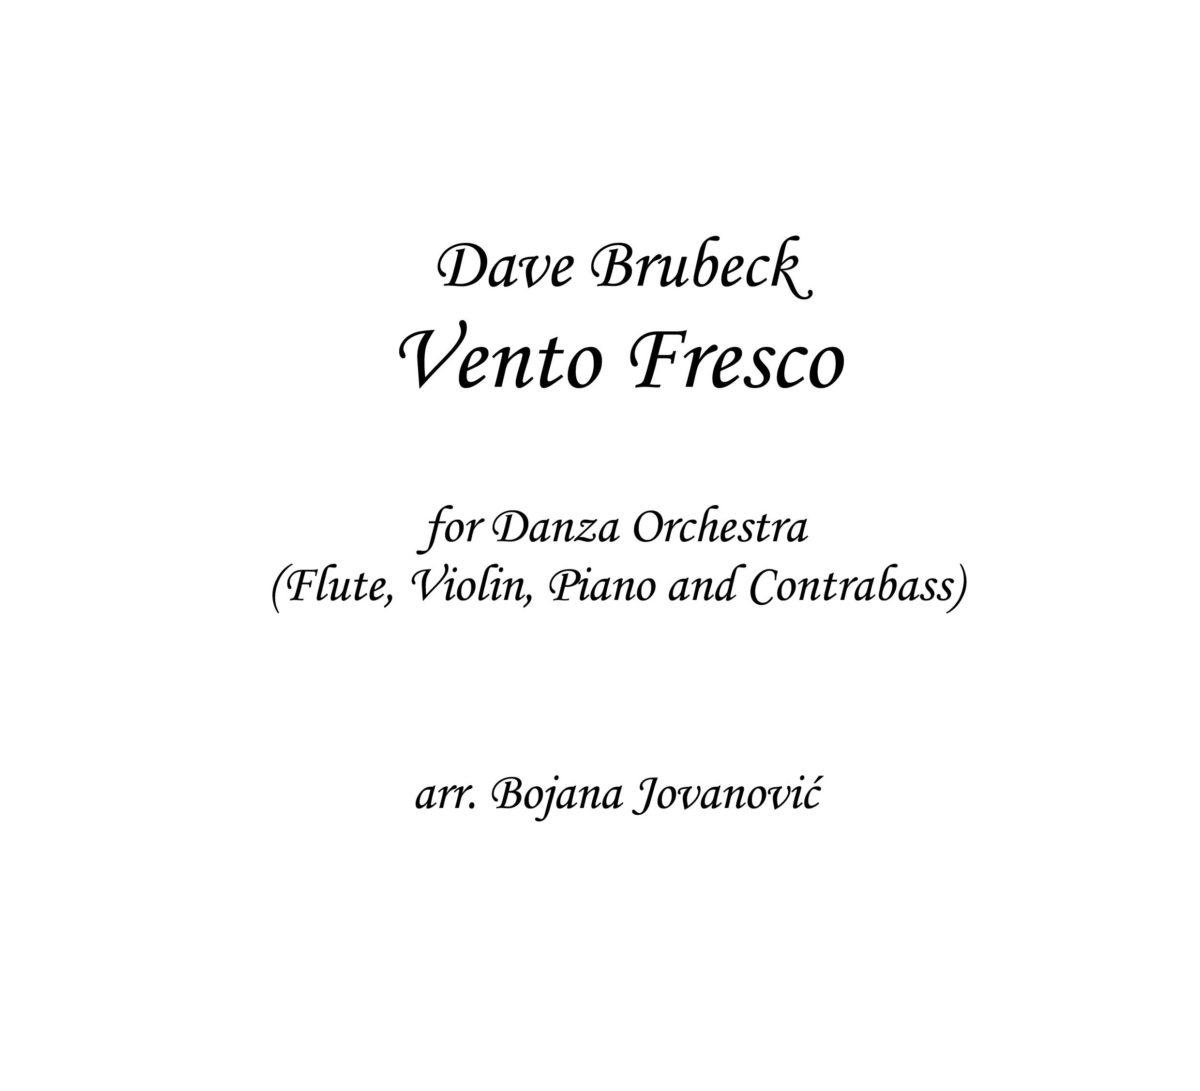 Vento Fresco Music score (Dave Brubeck)